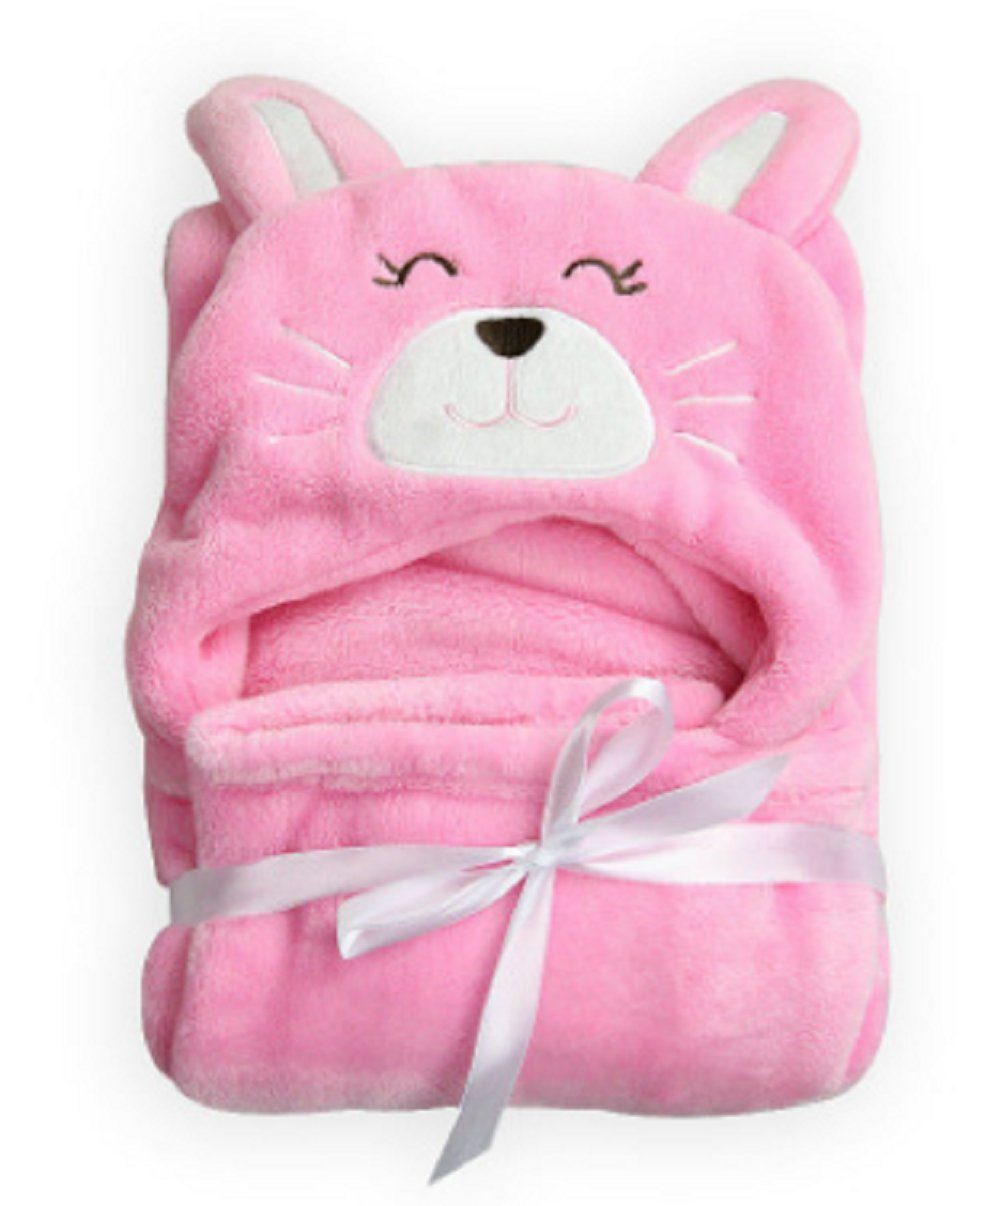 Baby Hooded Bath Towels Animal Bathrobe Fleece Towel Blanket Lion